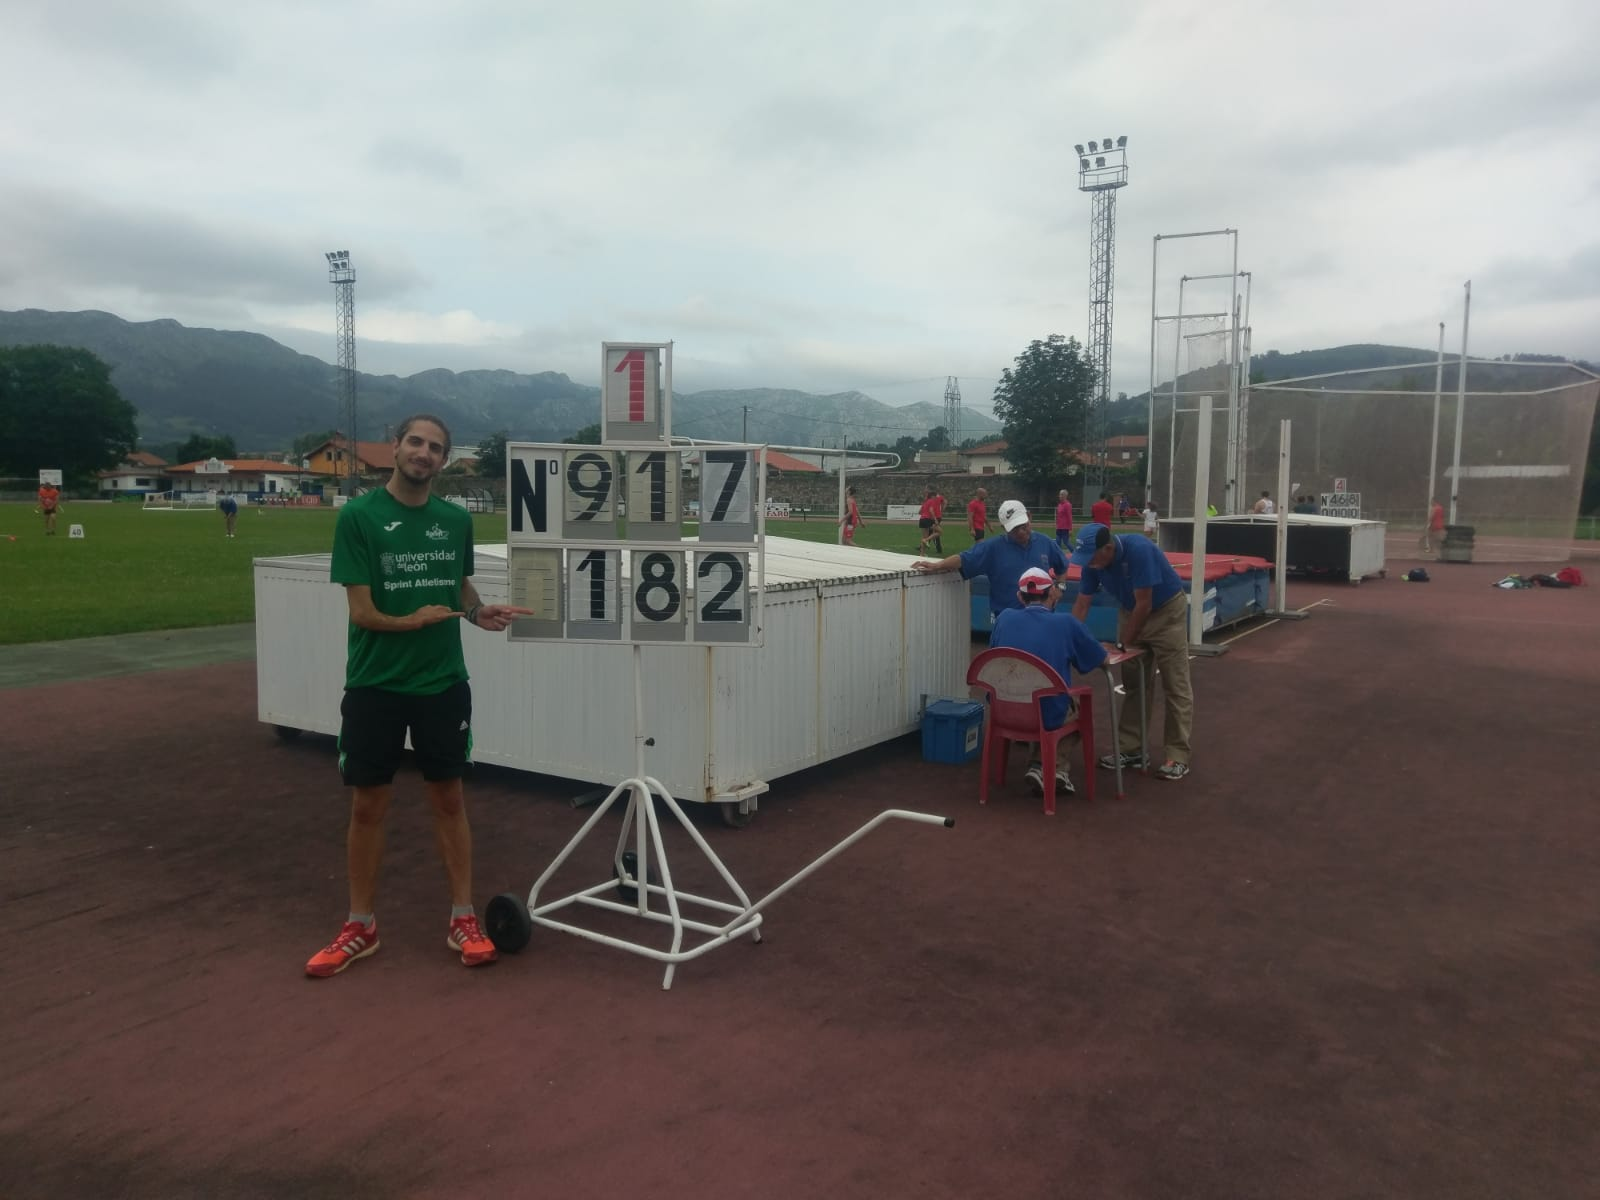 Dani Pérez posa con su nuevo récord de España de salto de altura. / FEDEACYL